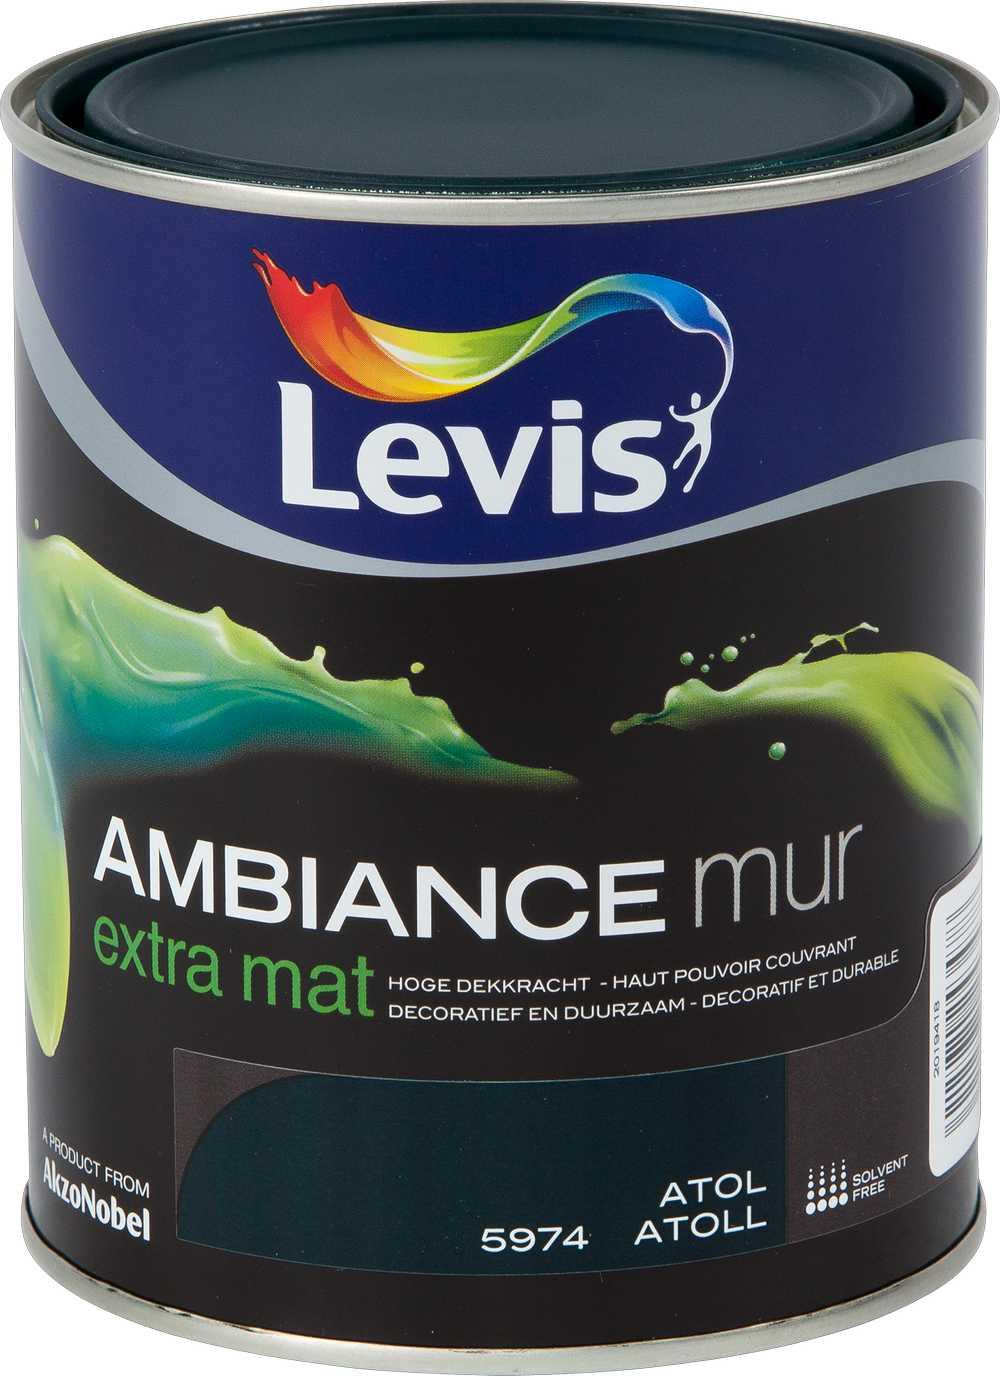 AMBIANCE MUR EXTRA MAT - ATOL 5974 1 L